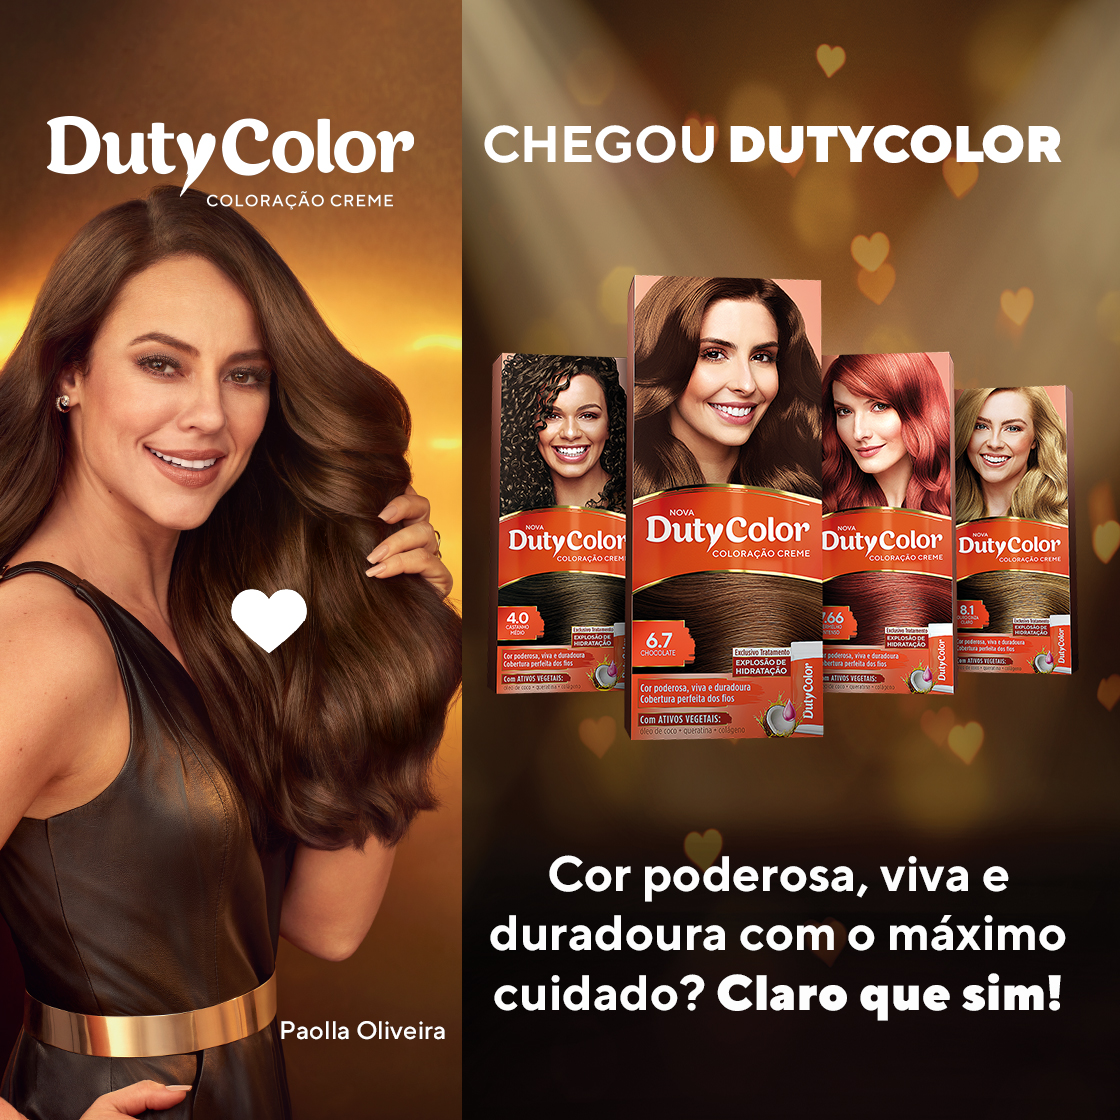 Duty Color